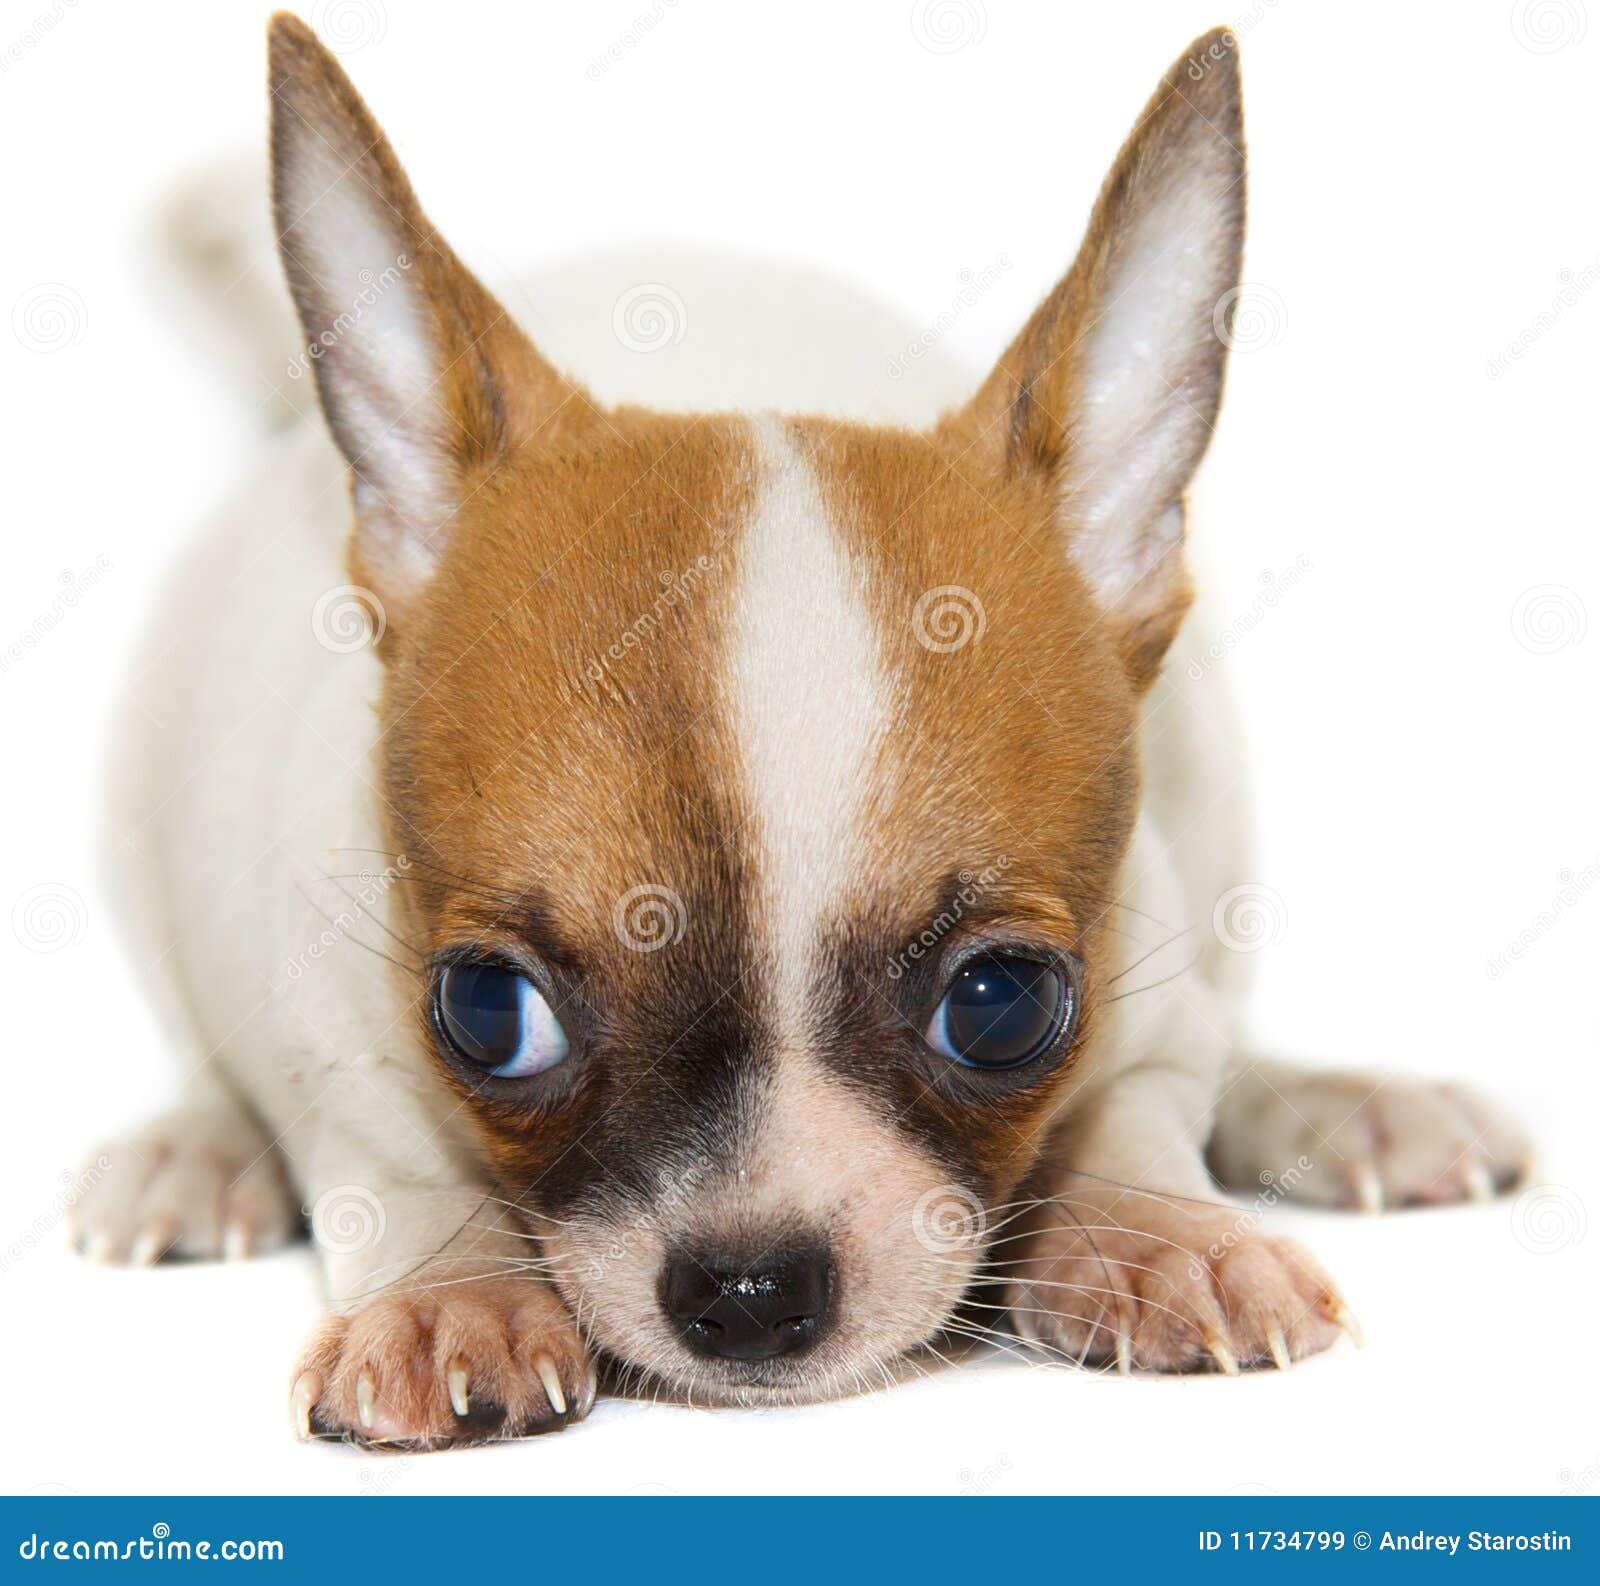 dog chihuahua background - photo #49